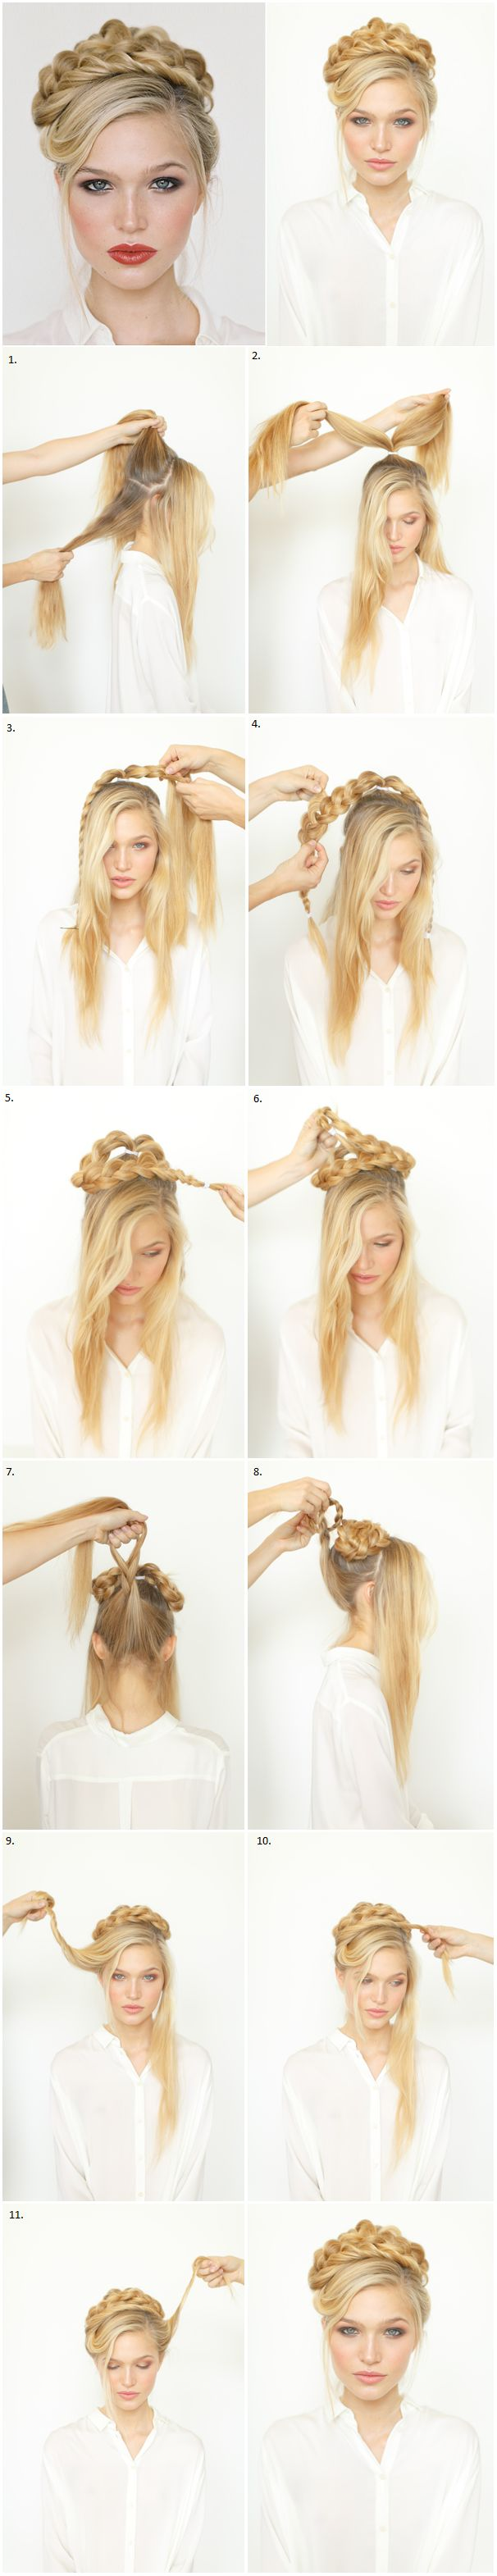 How To Make An Astonishing Braided Bun